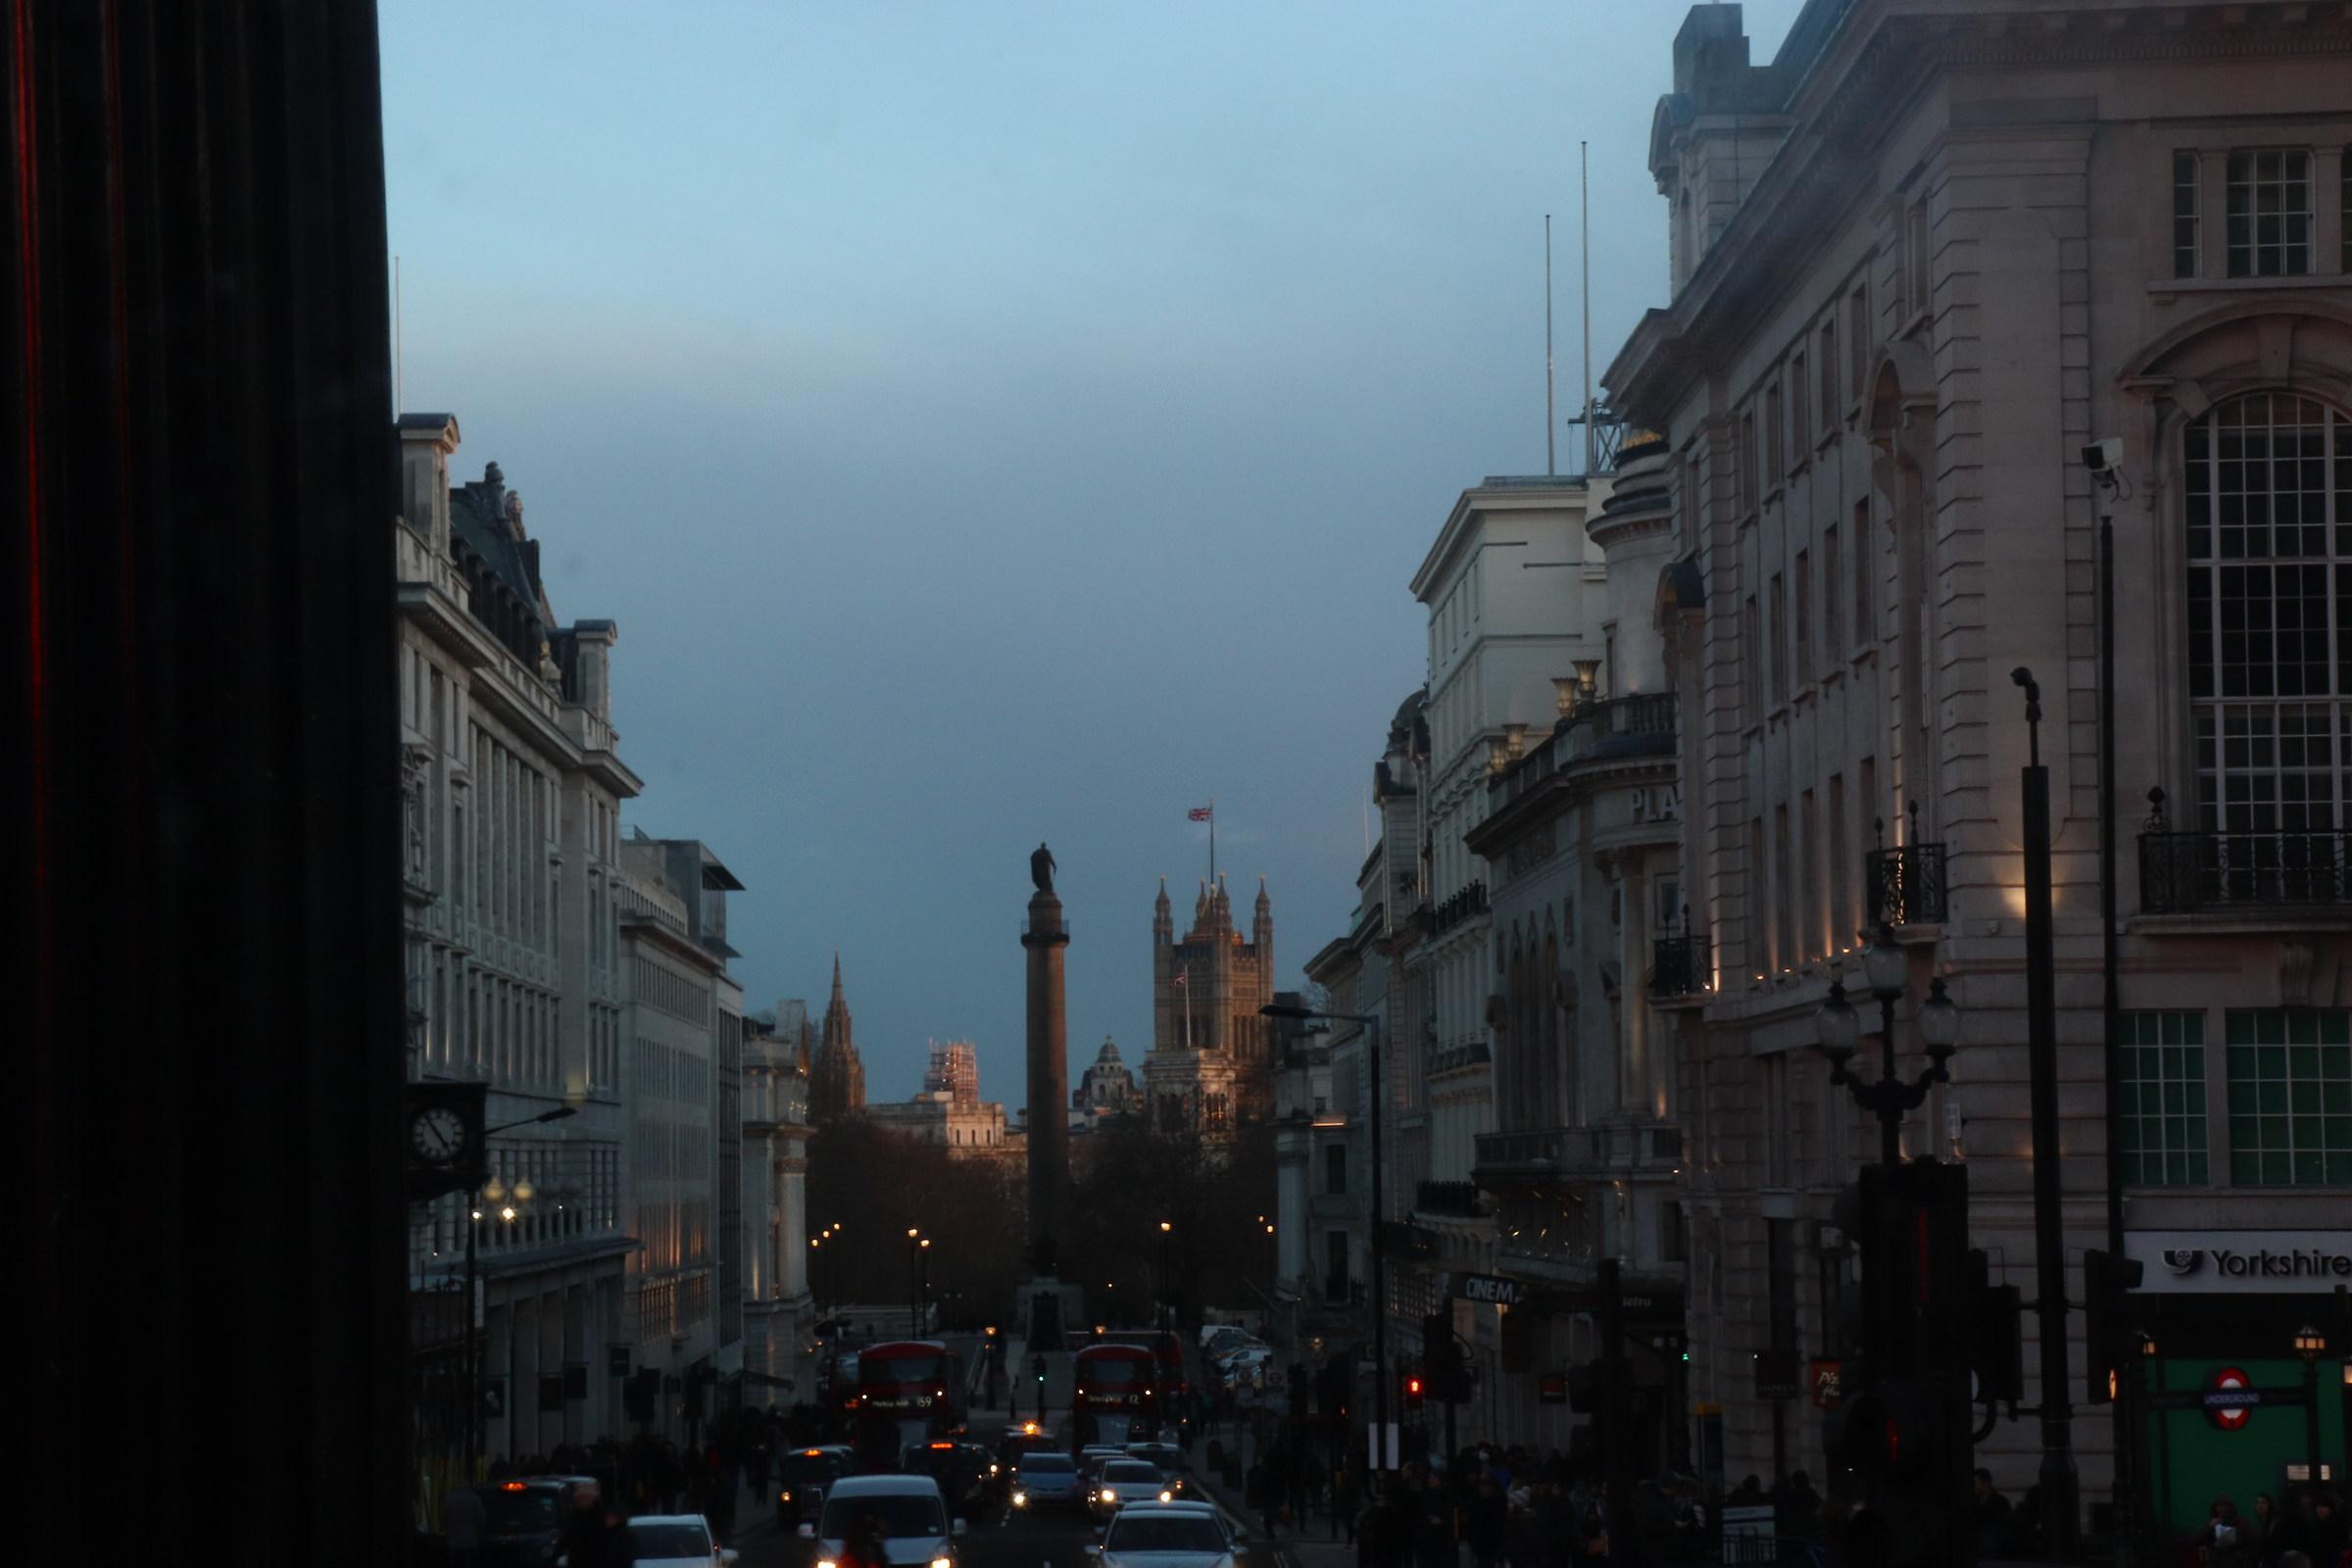 Sunset in London...